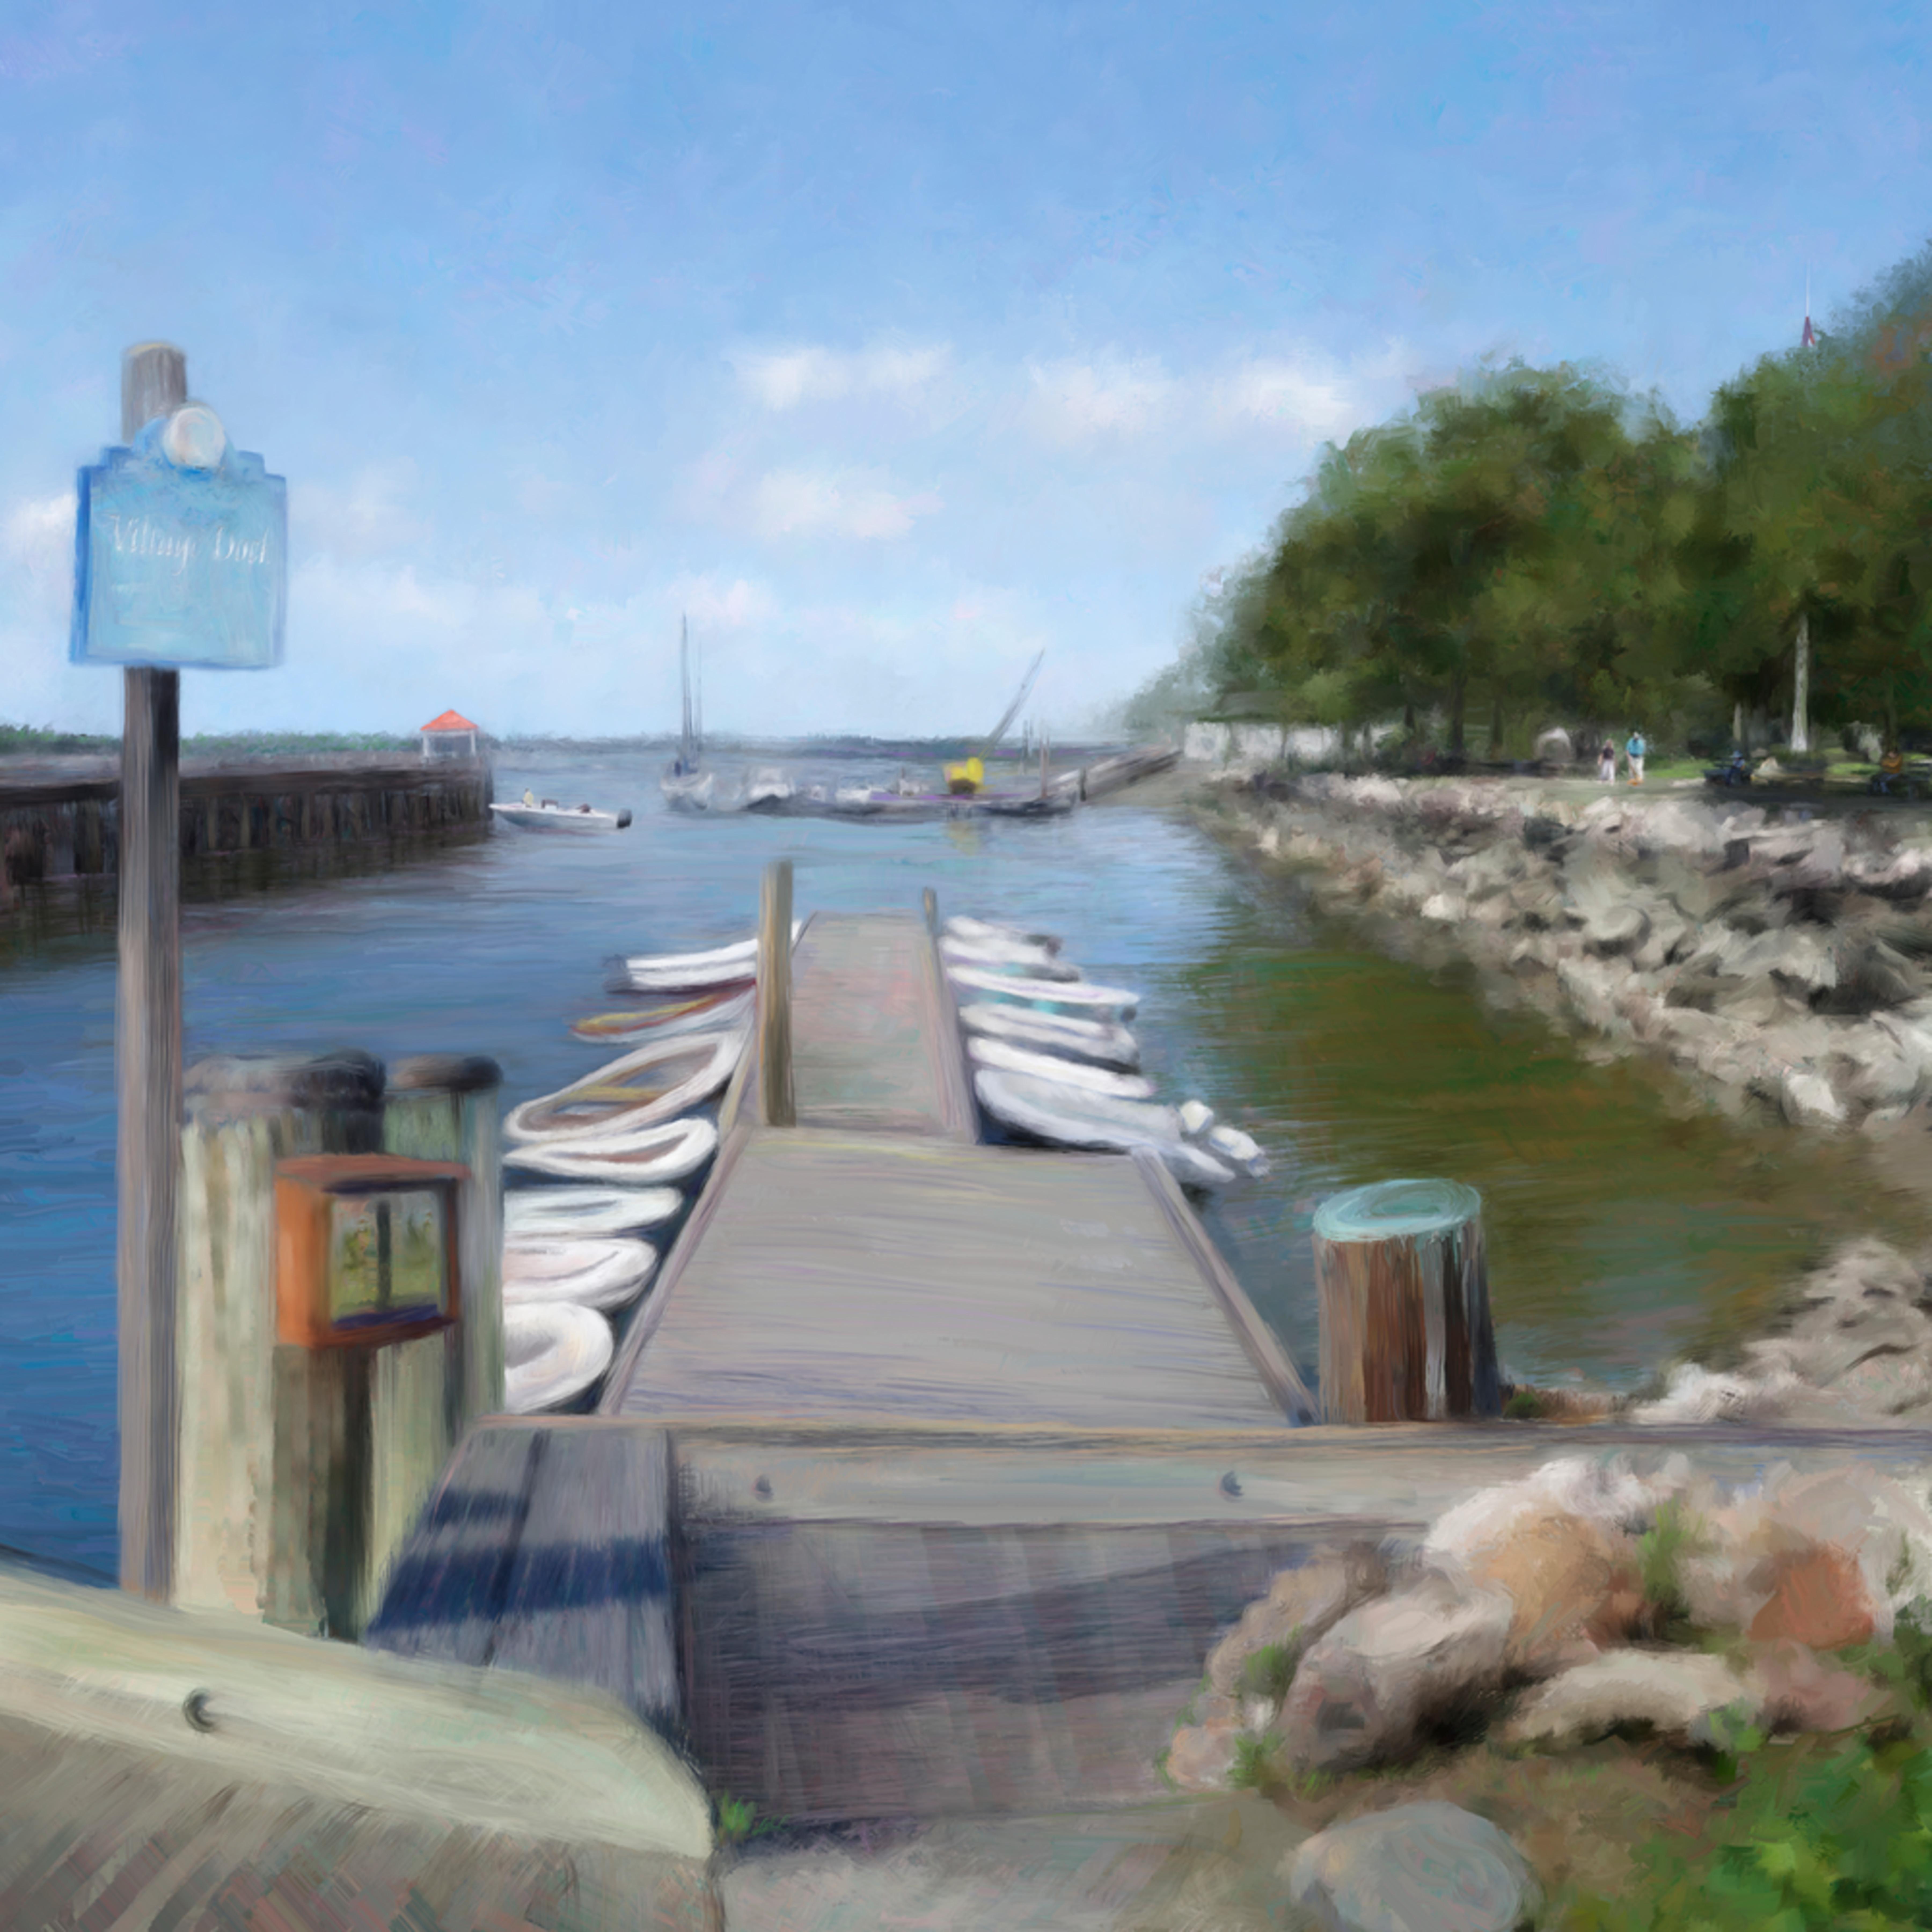 151201 ahern northport harbor 24x36x300 udarx8